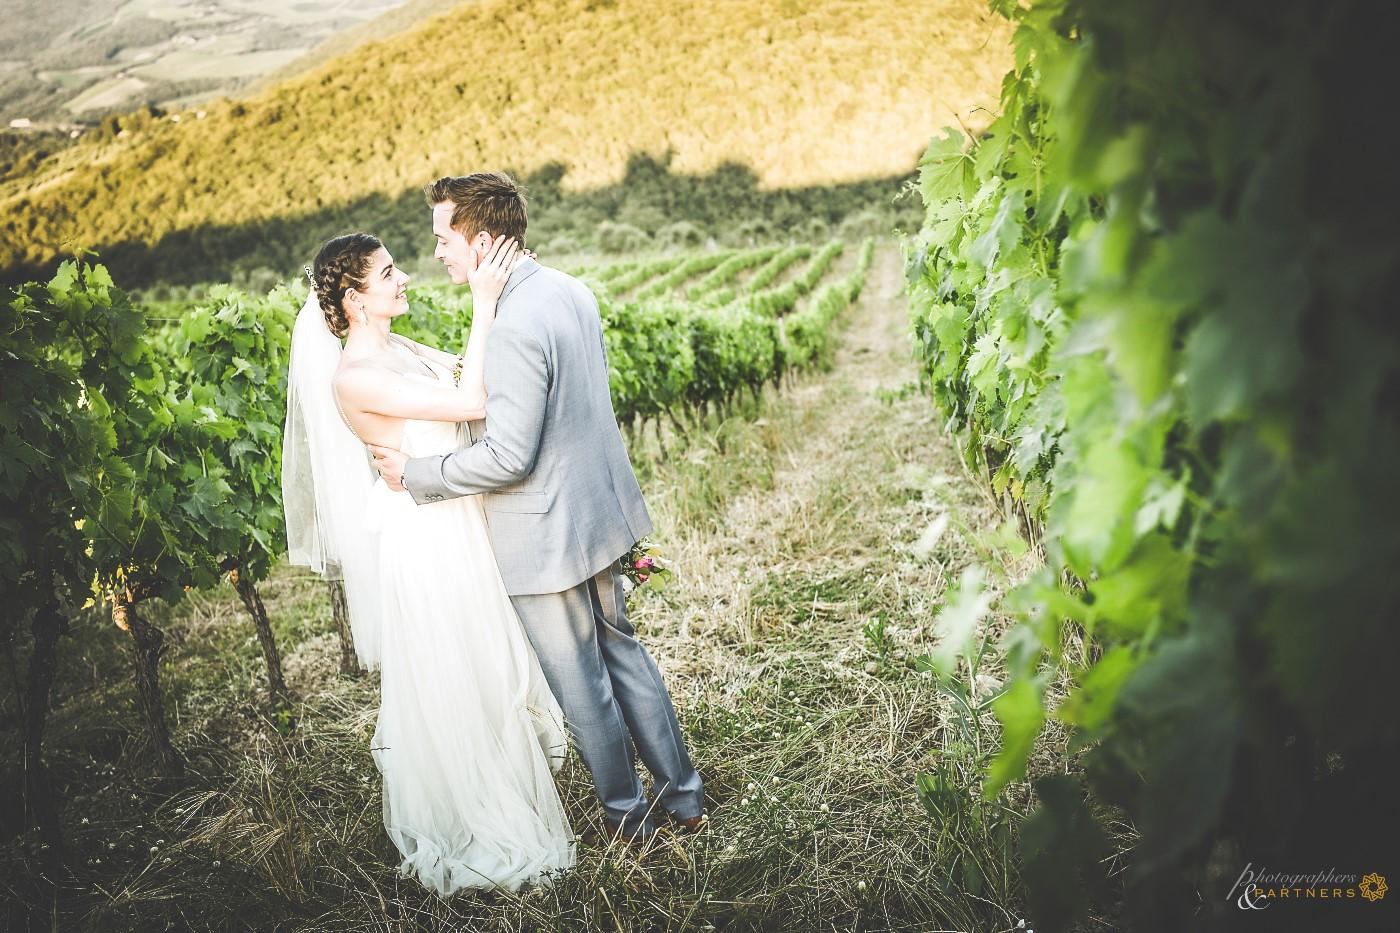 photographers_weddings_italy_12.jpg